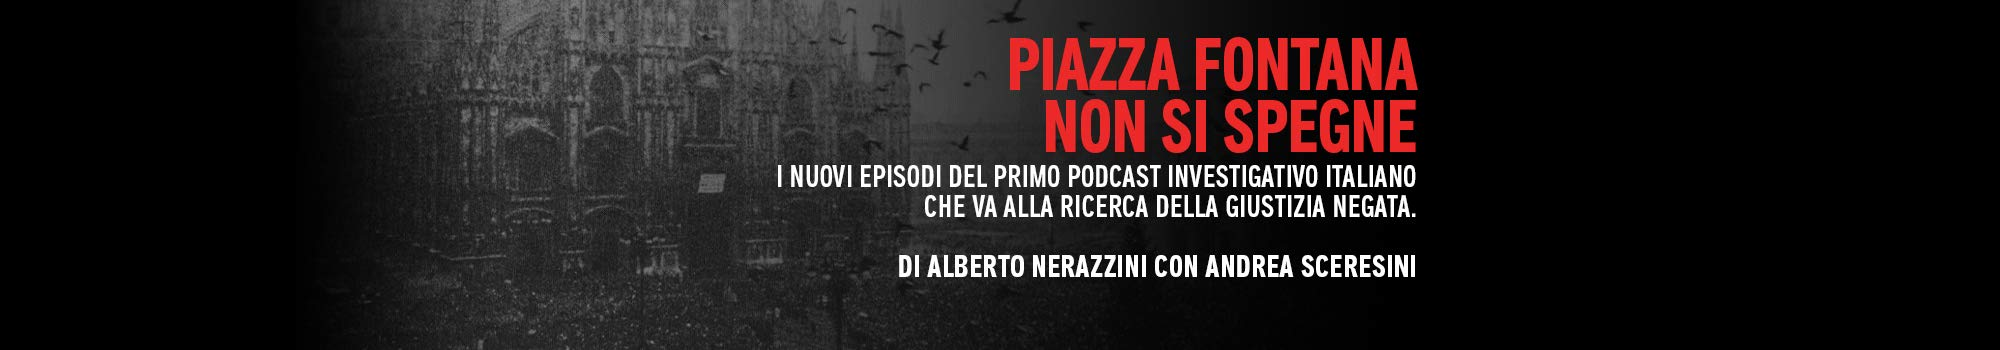 121269. Inchiesta su Piazza Fontana